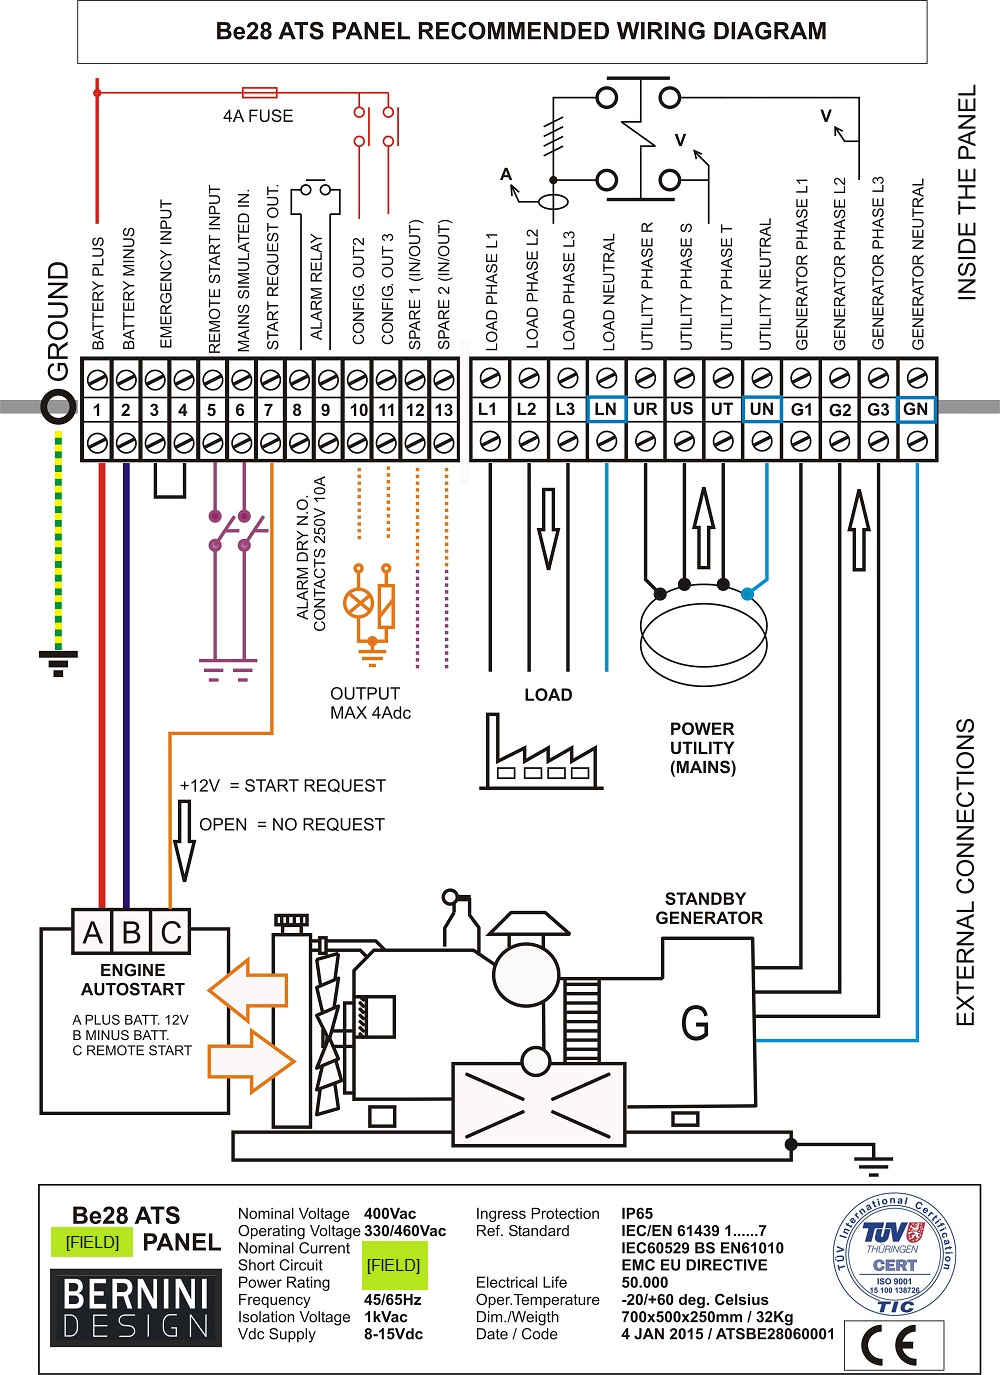 wiring standby generator transfer switch diagram?resize\=665%2C914\&ssl\=1 cat d5g wiring diagram cat d8n wiring diagram, cat 420d wiring Cat D5G Specifications at soozxer.org